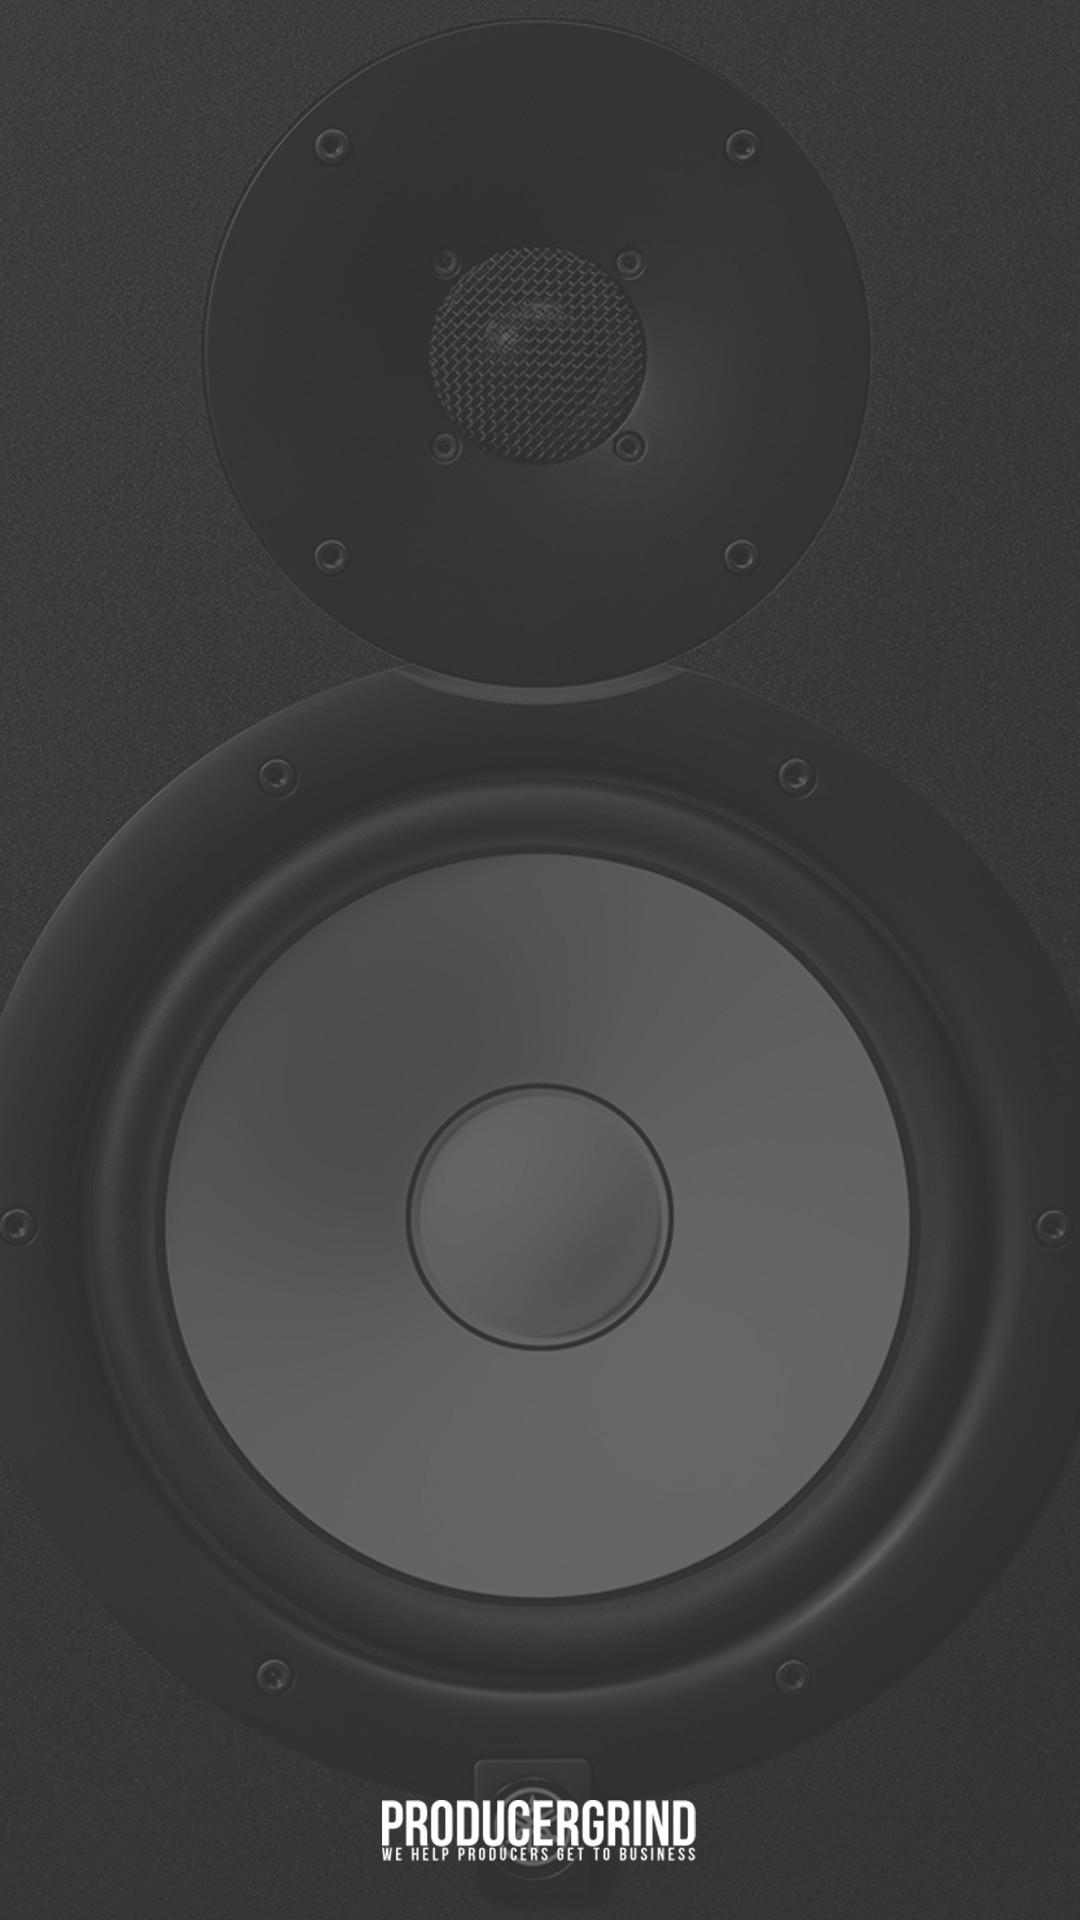 Yamaha hs8 wallpaper for iPhone HD